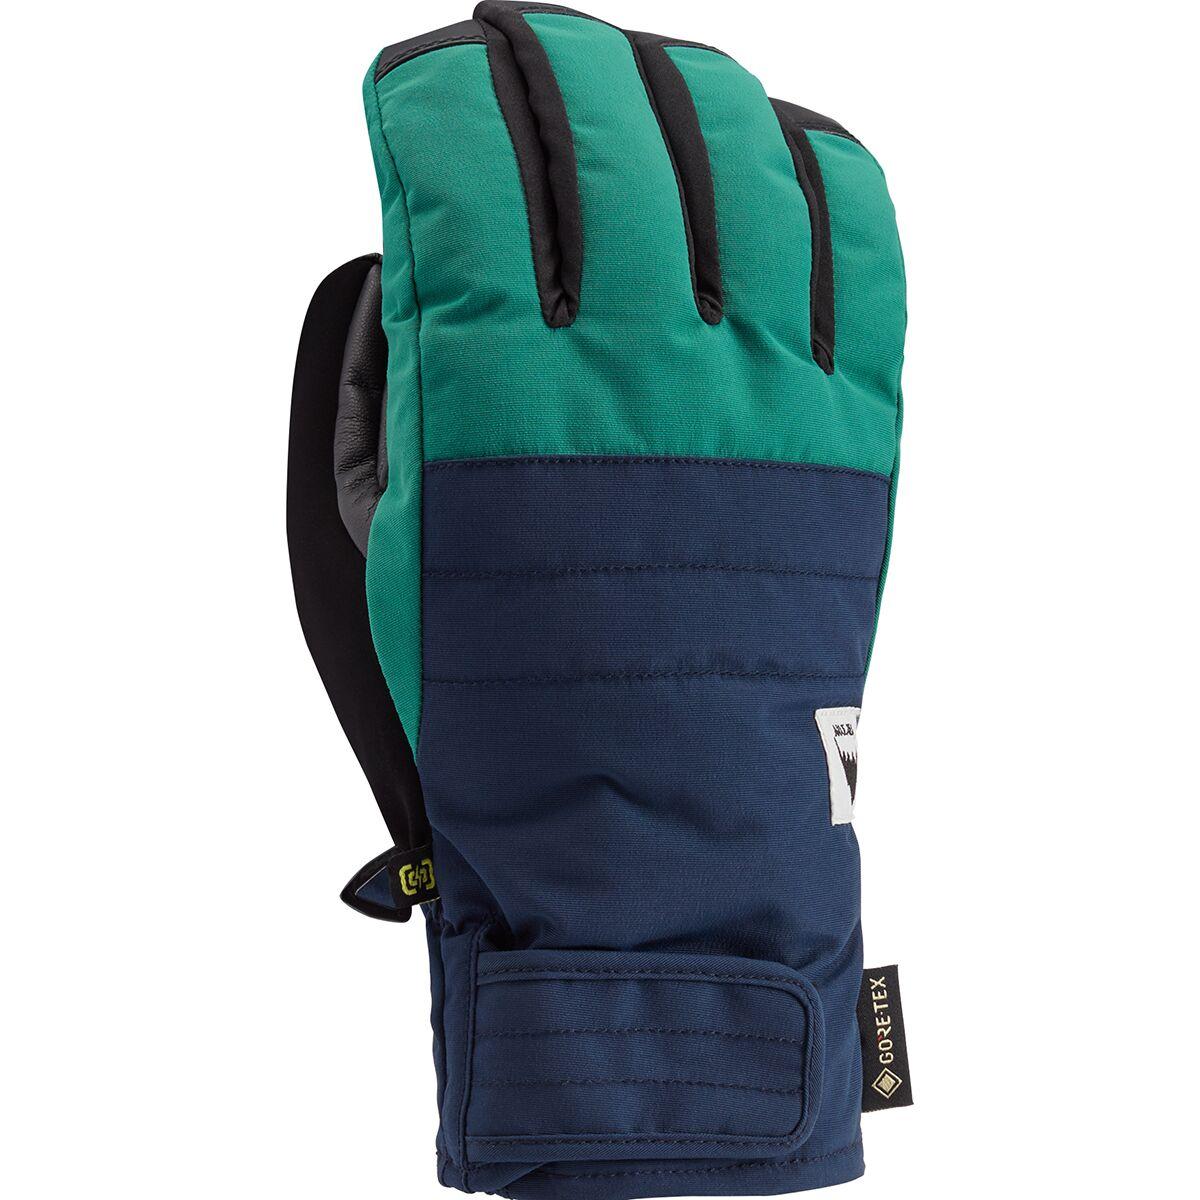 Reverb GORE-TEX Glove - Men